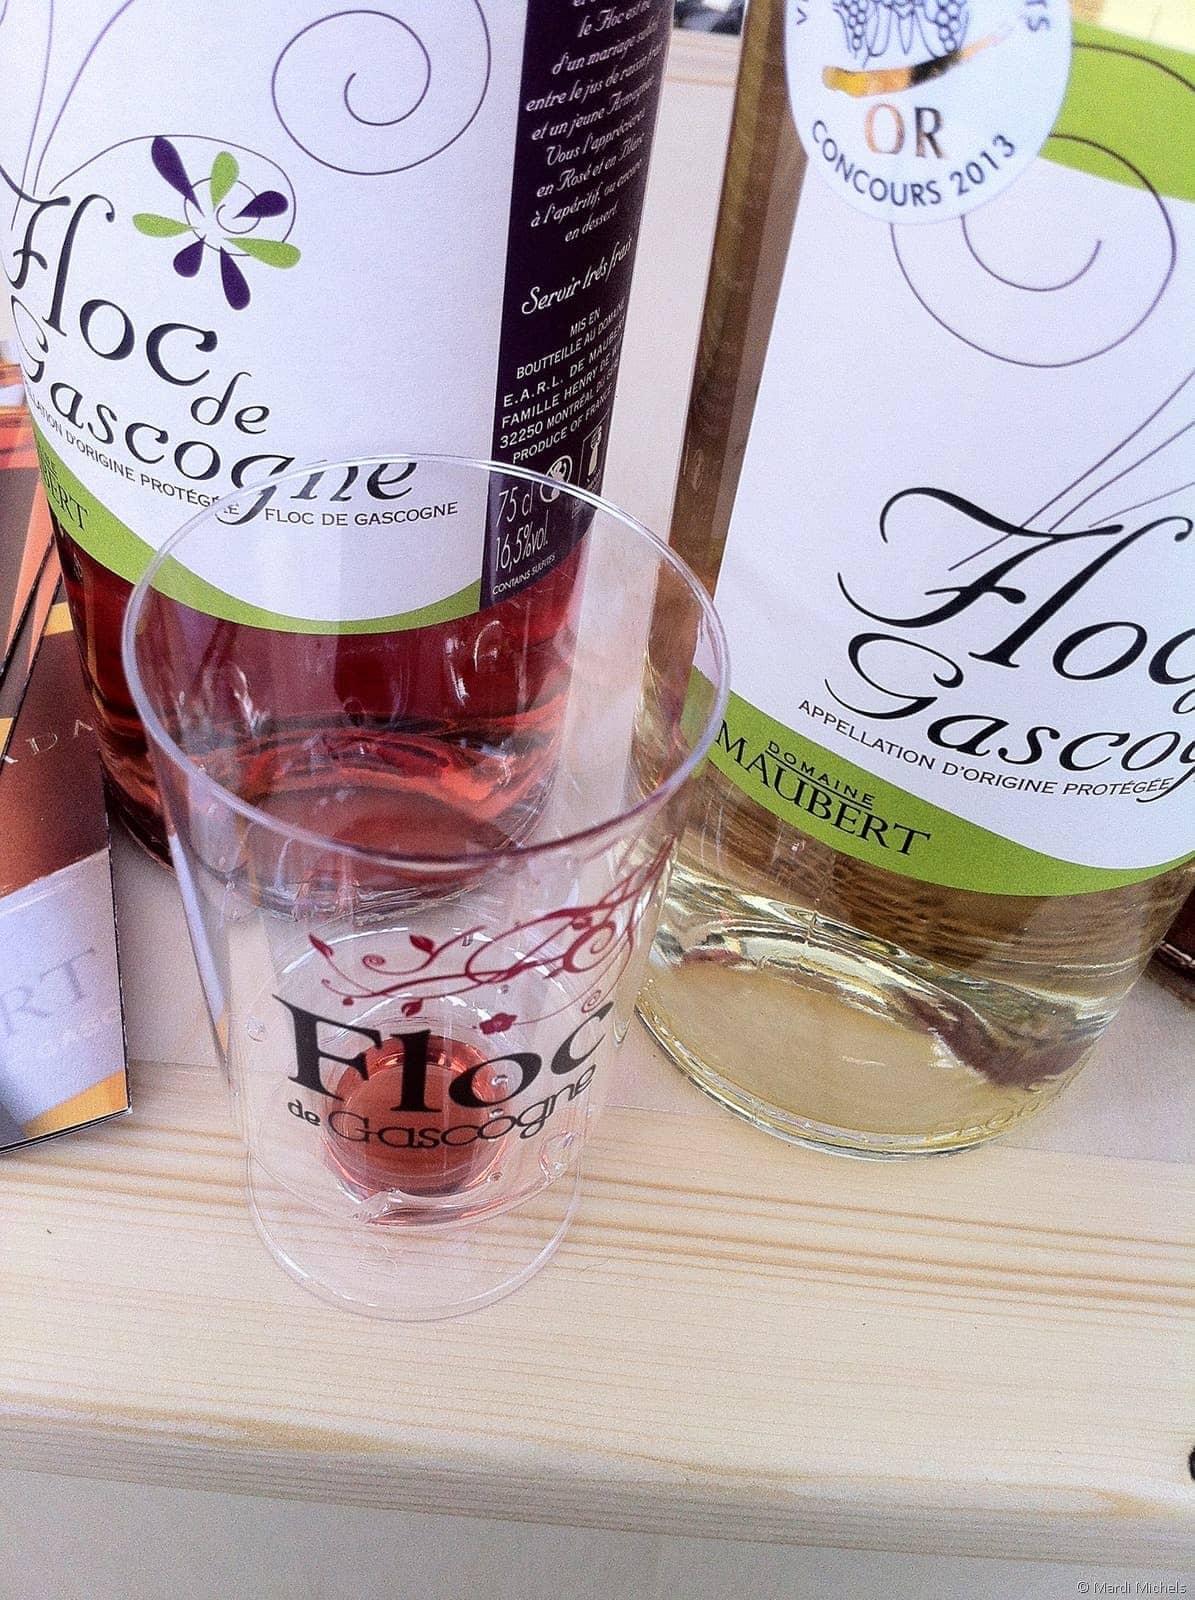 floc wine photo credit Mardi Michels